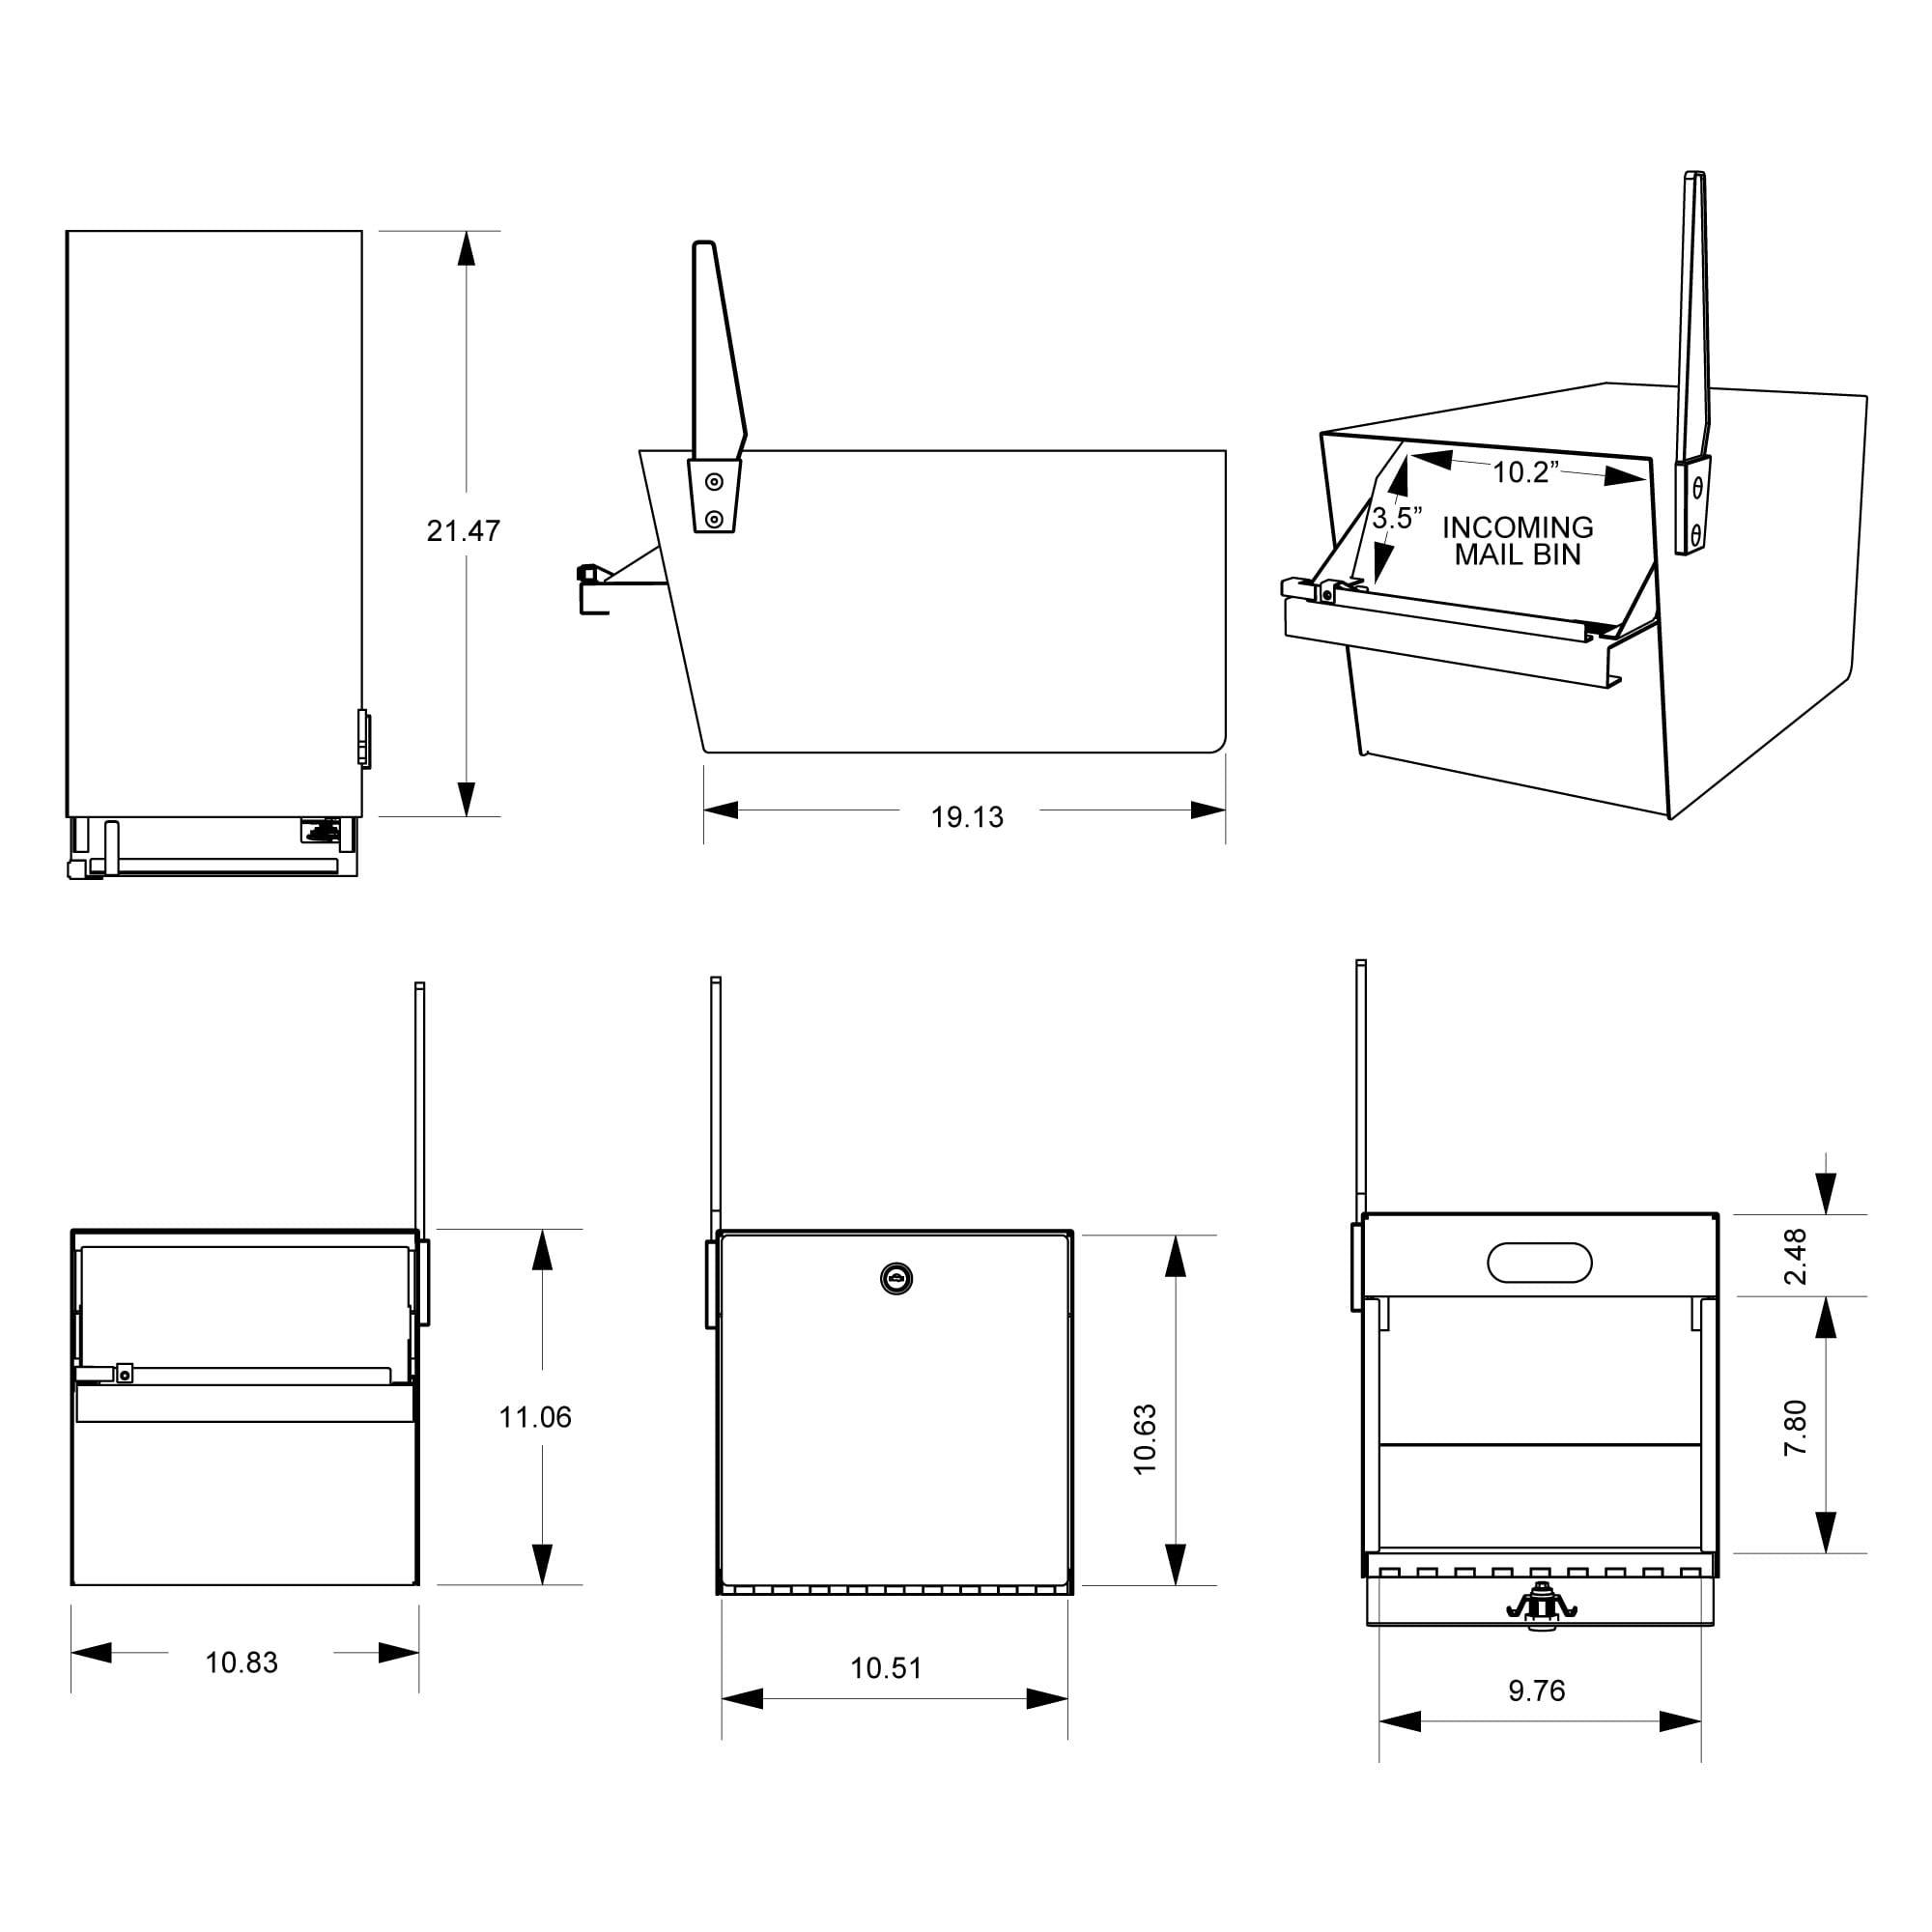 Street Safe Street Safe 2 Door, front and back door Locking mailbox measurements dimensions